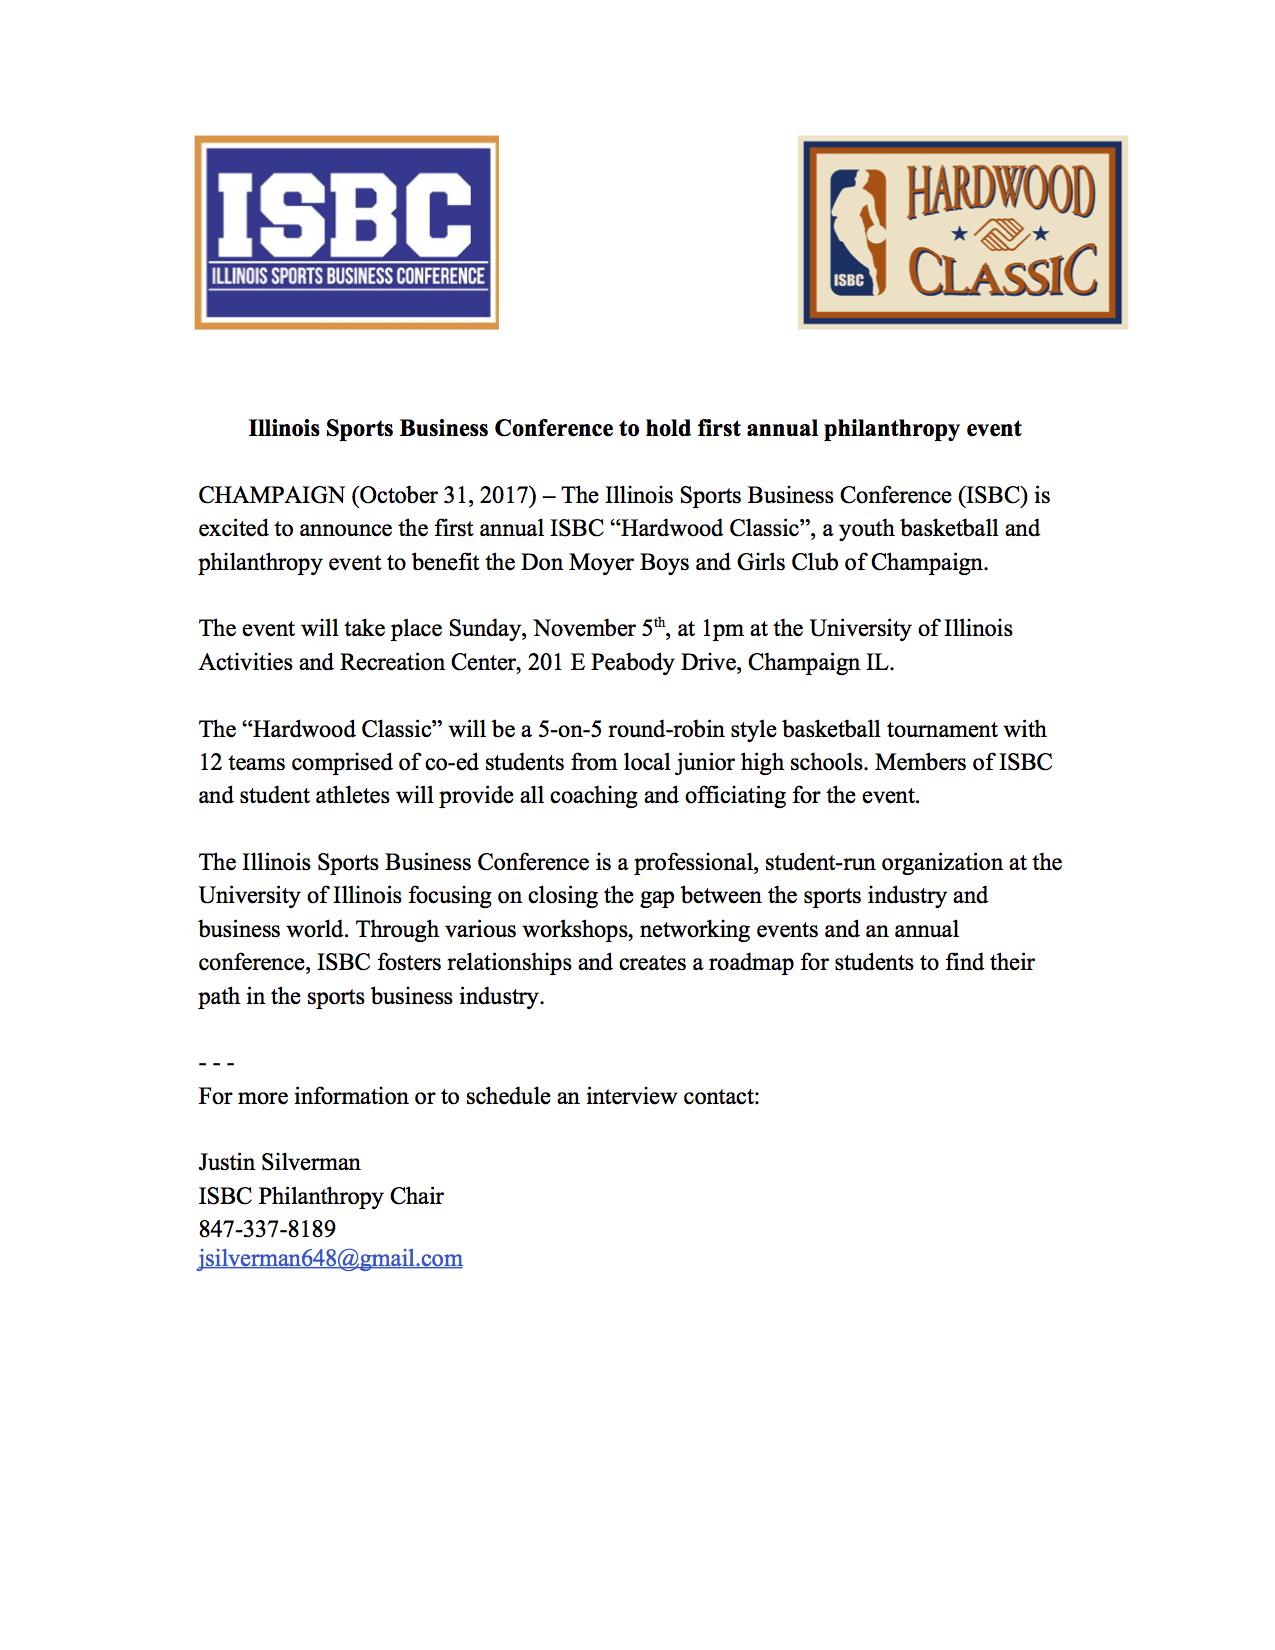 ISBC Press Release.png